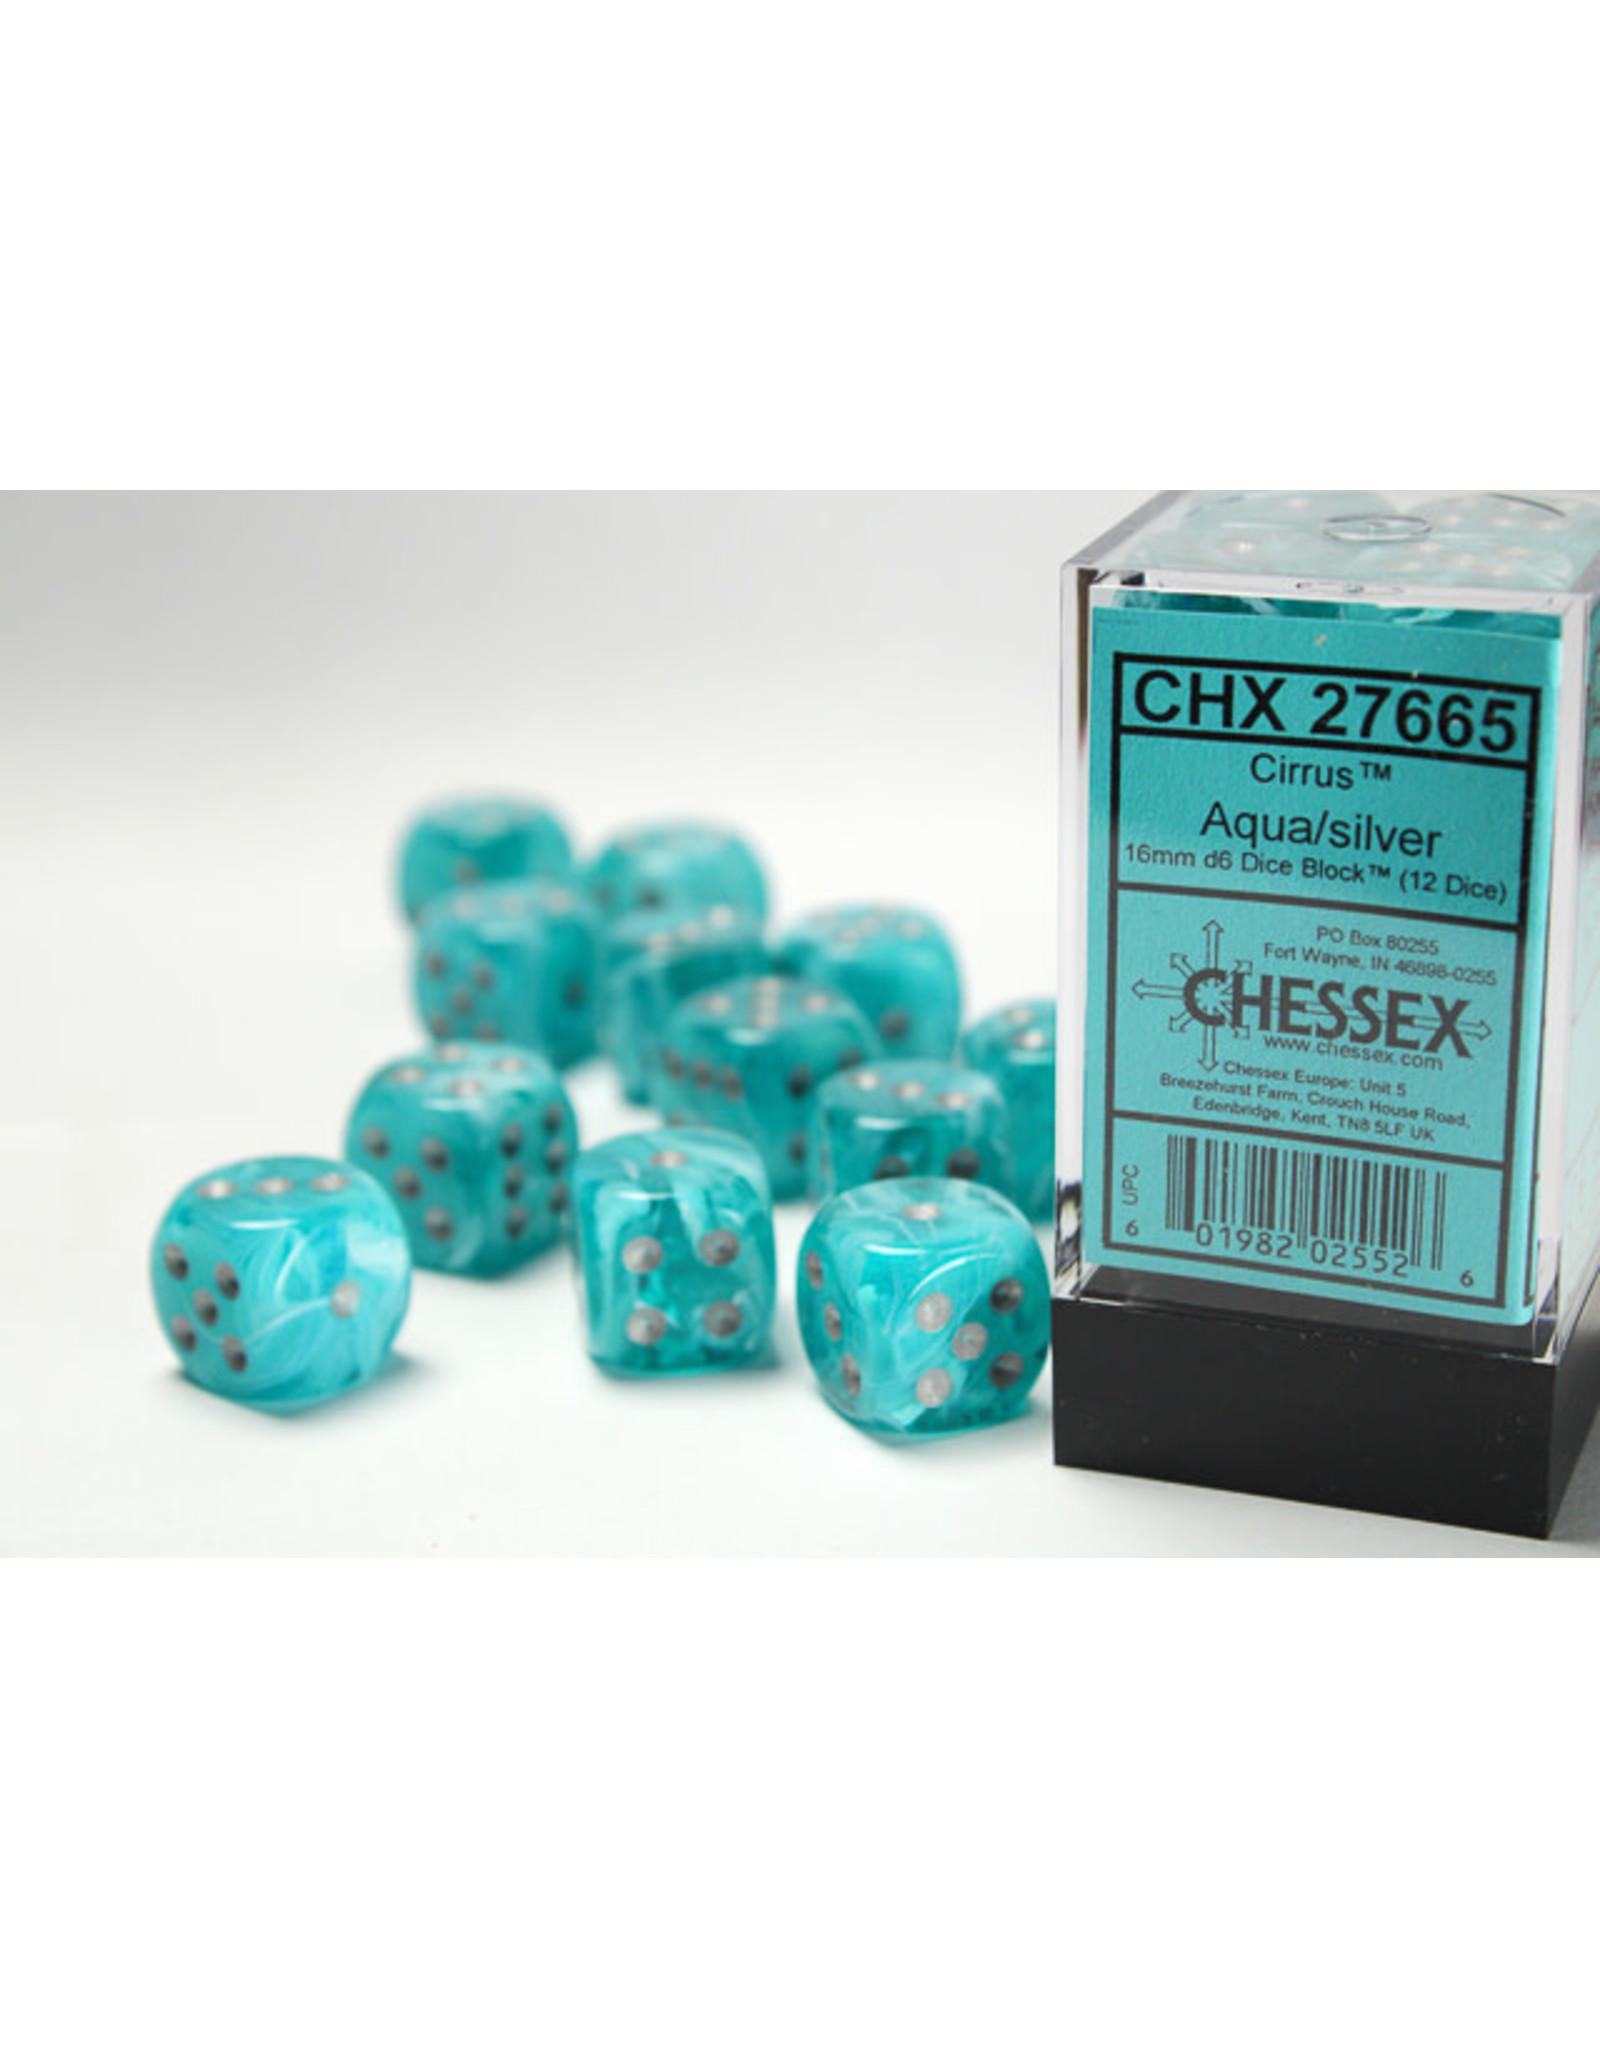 Chessex Chessex Cirrus 16mm (12d6)